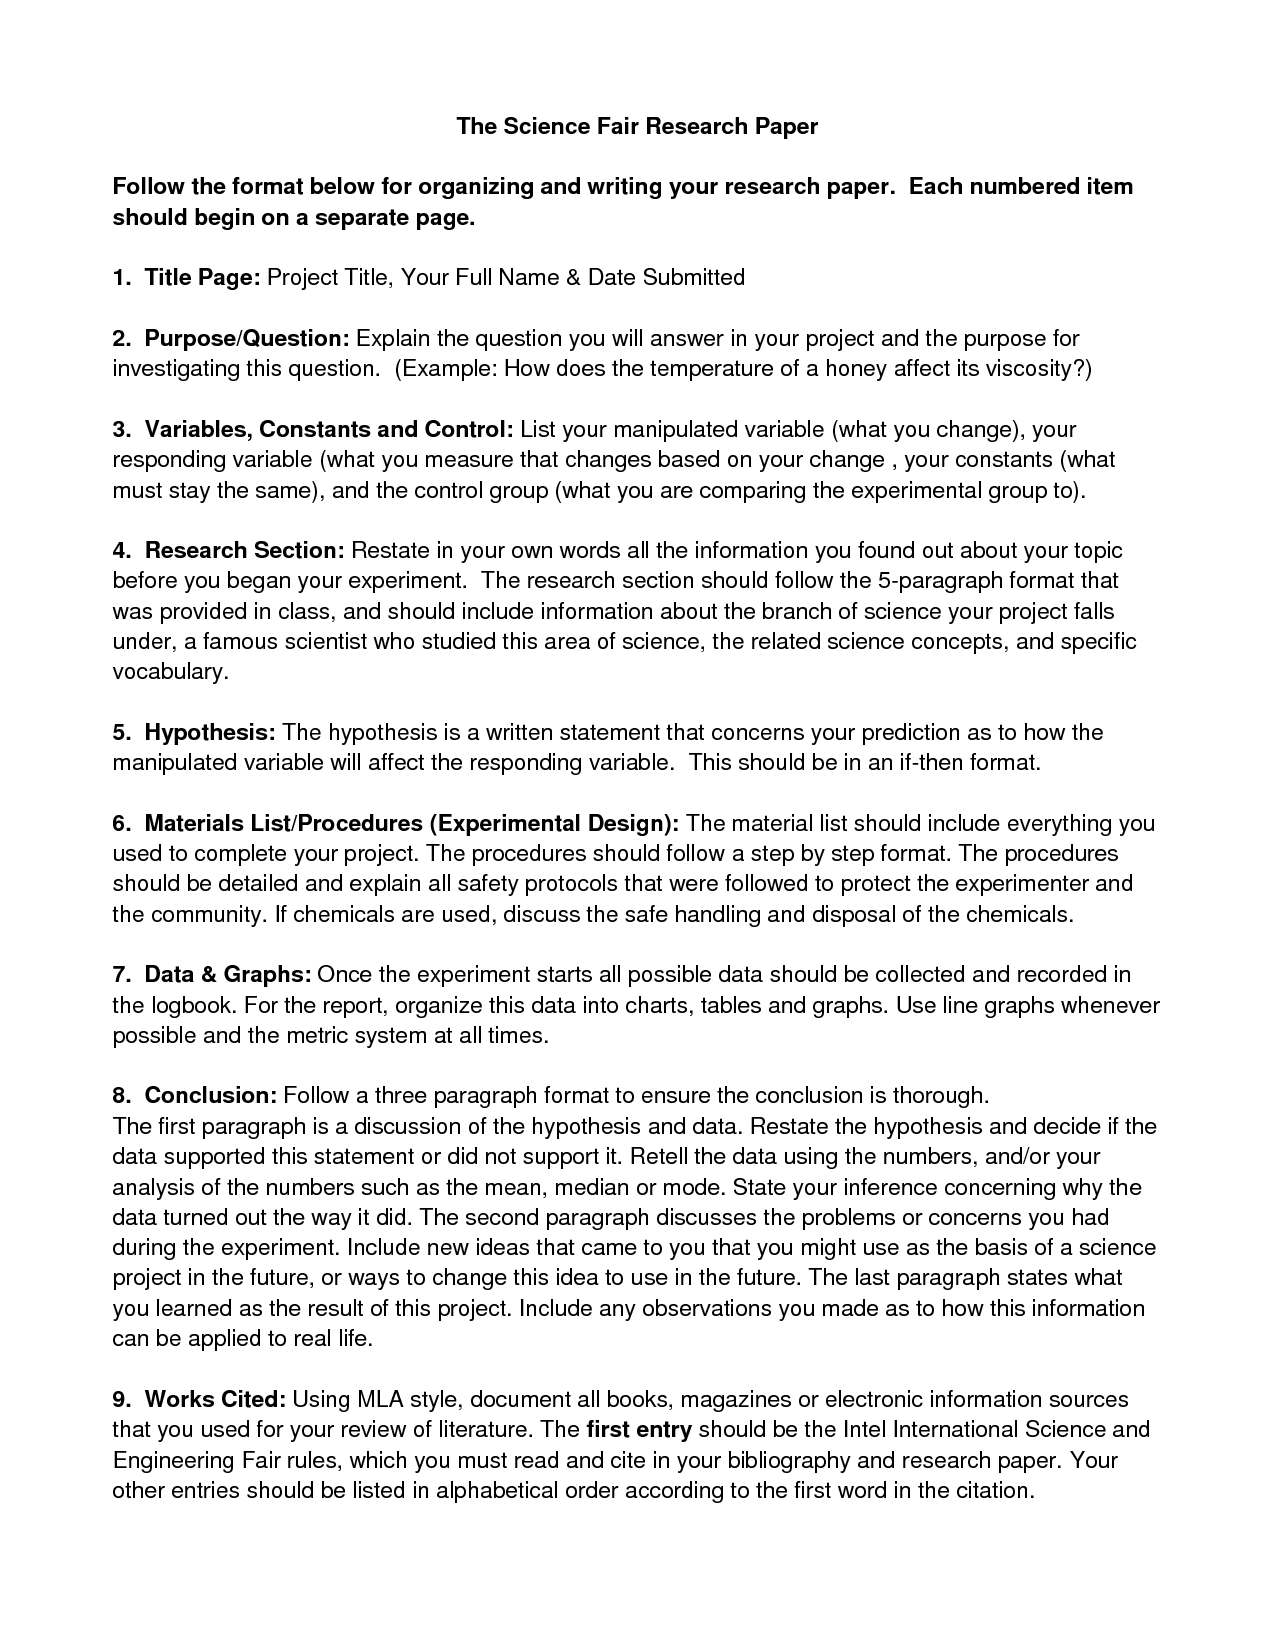 10 Stylish List Of Science Fair Ideas ideas of science fair research paper outline unique political 2021